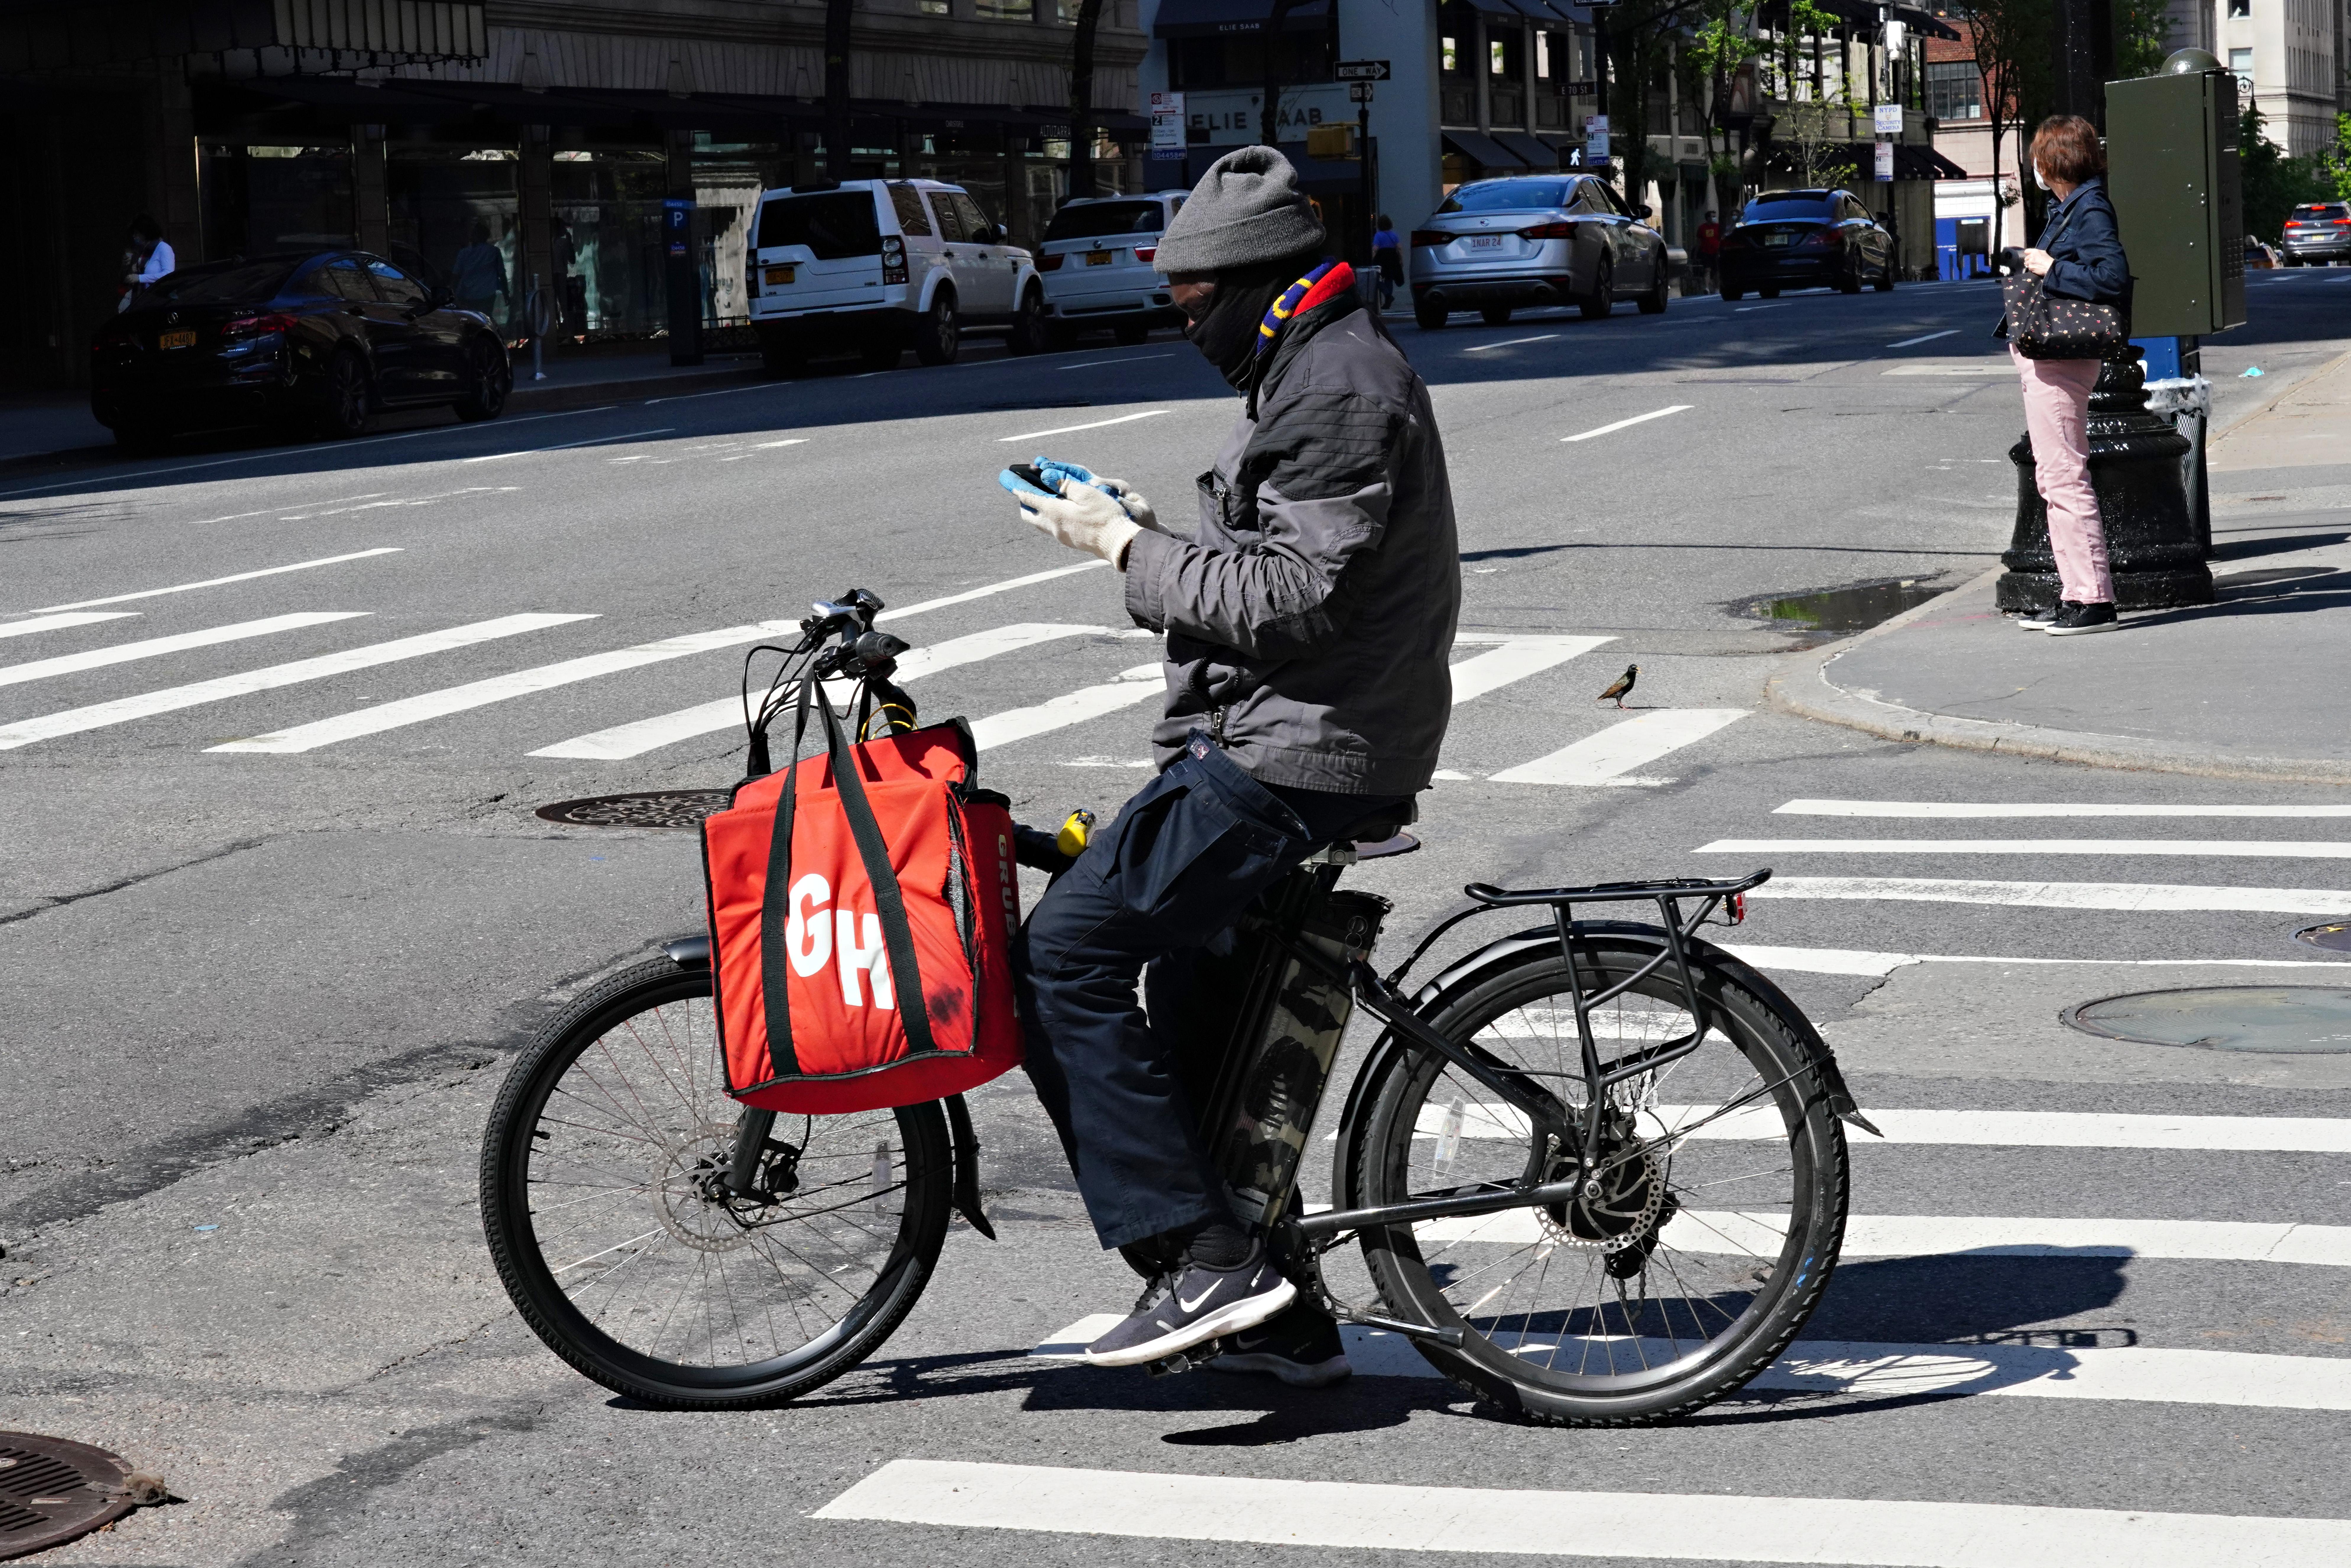 Man on bike wearing face mask checks phone, a Grubhub bag is hanging from the handlebars.